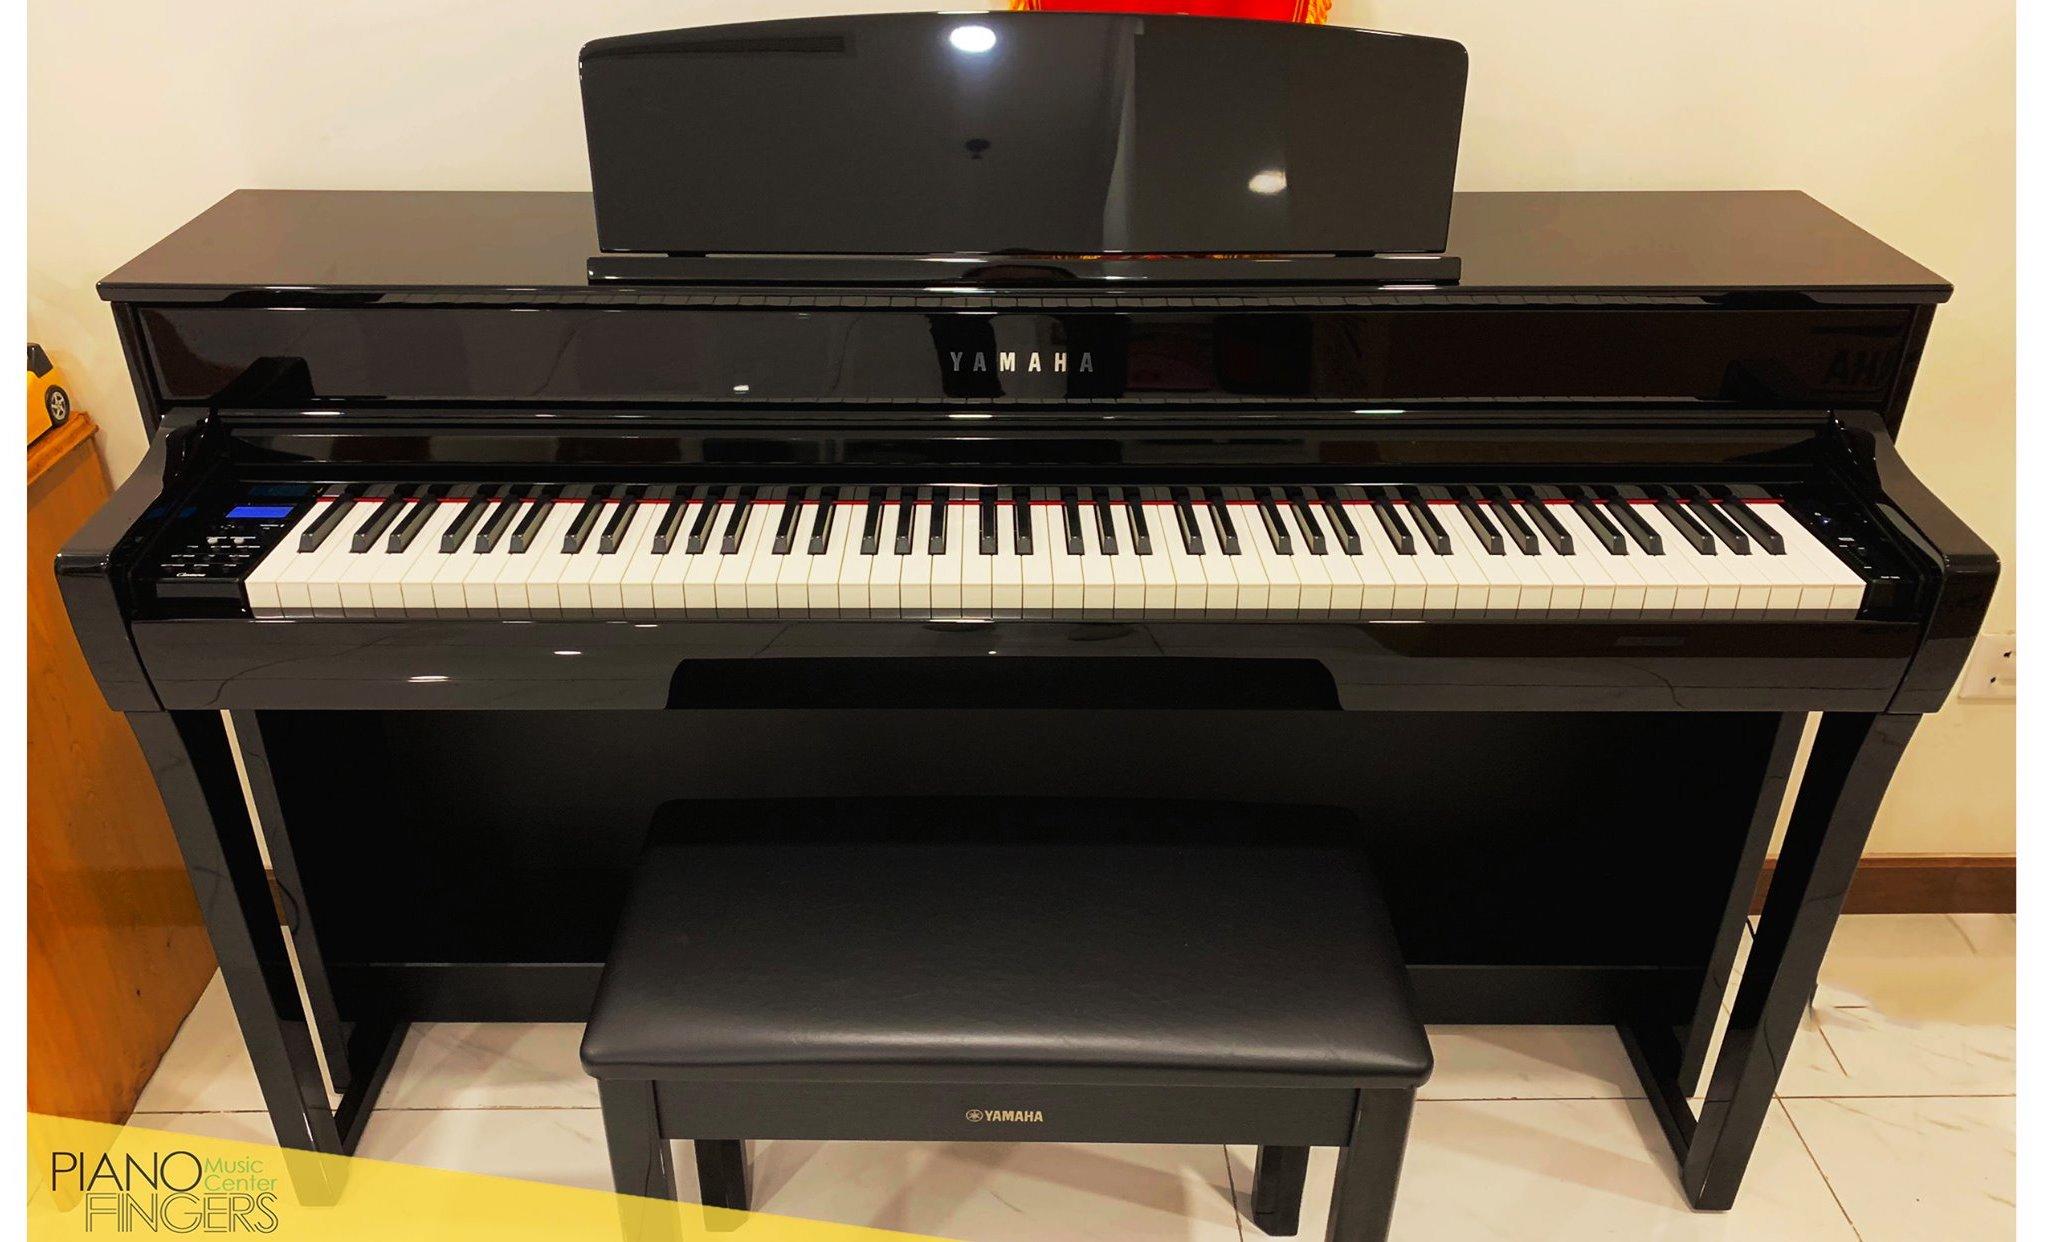 top-dia-chi-ban-piano-chat-luong-tp-hcm-yamaha-clp-745-pe